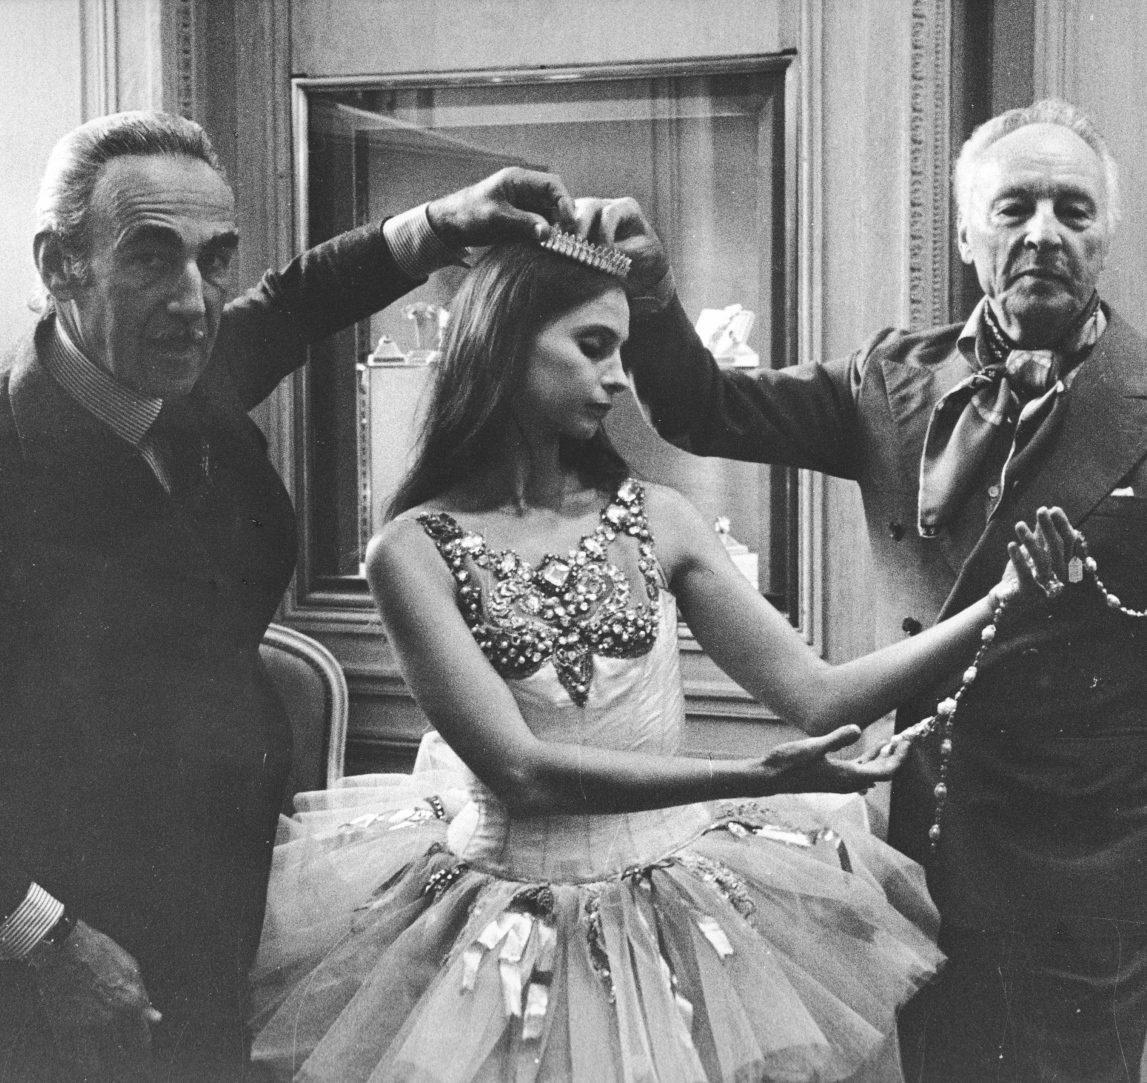 Van Cleef & Arpels Marries the World of Ballet and Jewellery